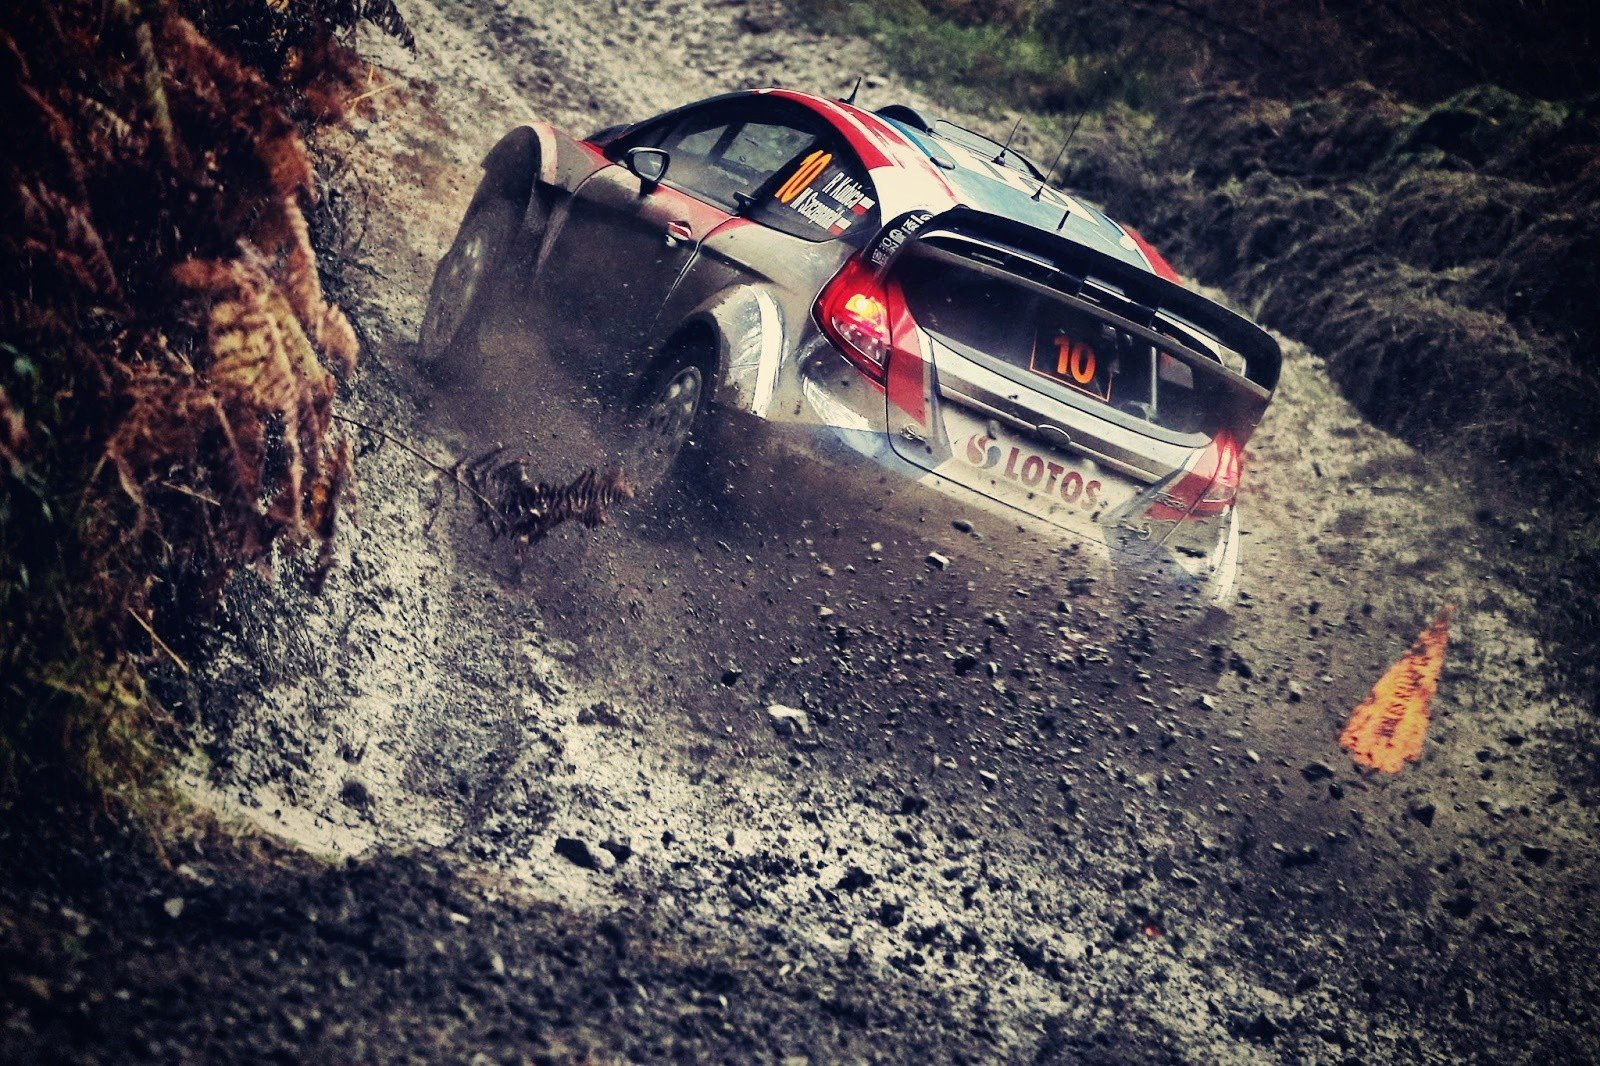 World Rally Championship >> wrc, Race cars, Formula 1, Rallye, Rally cars, Ford Fiesta ...